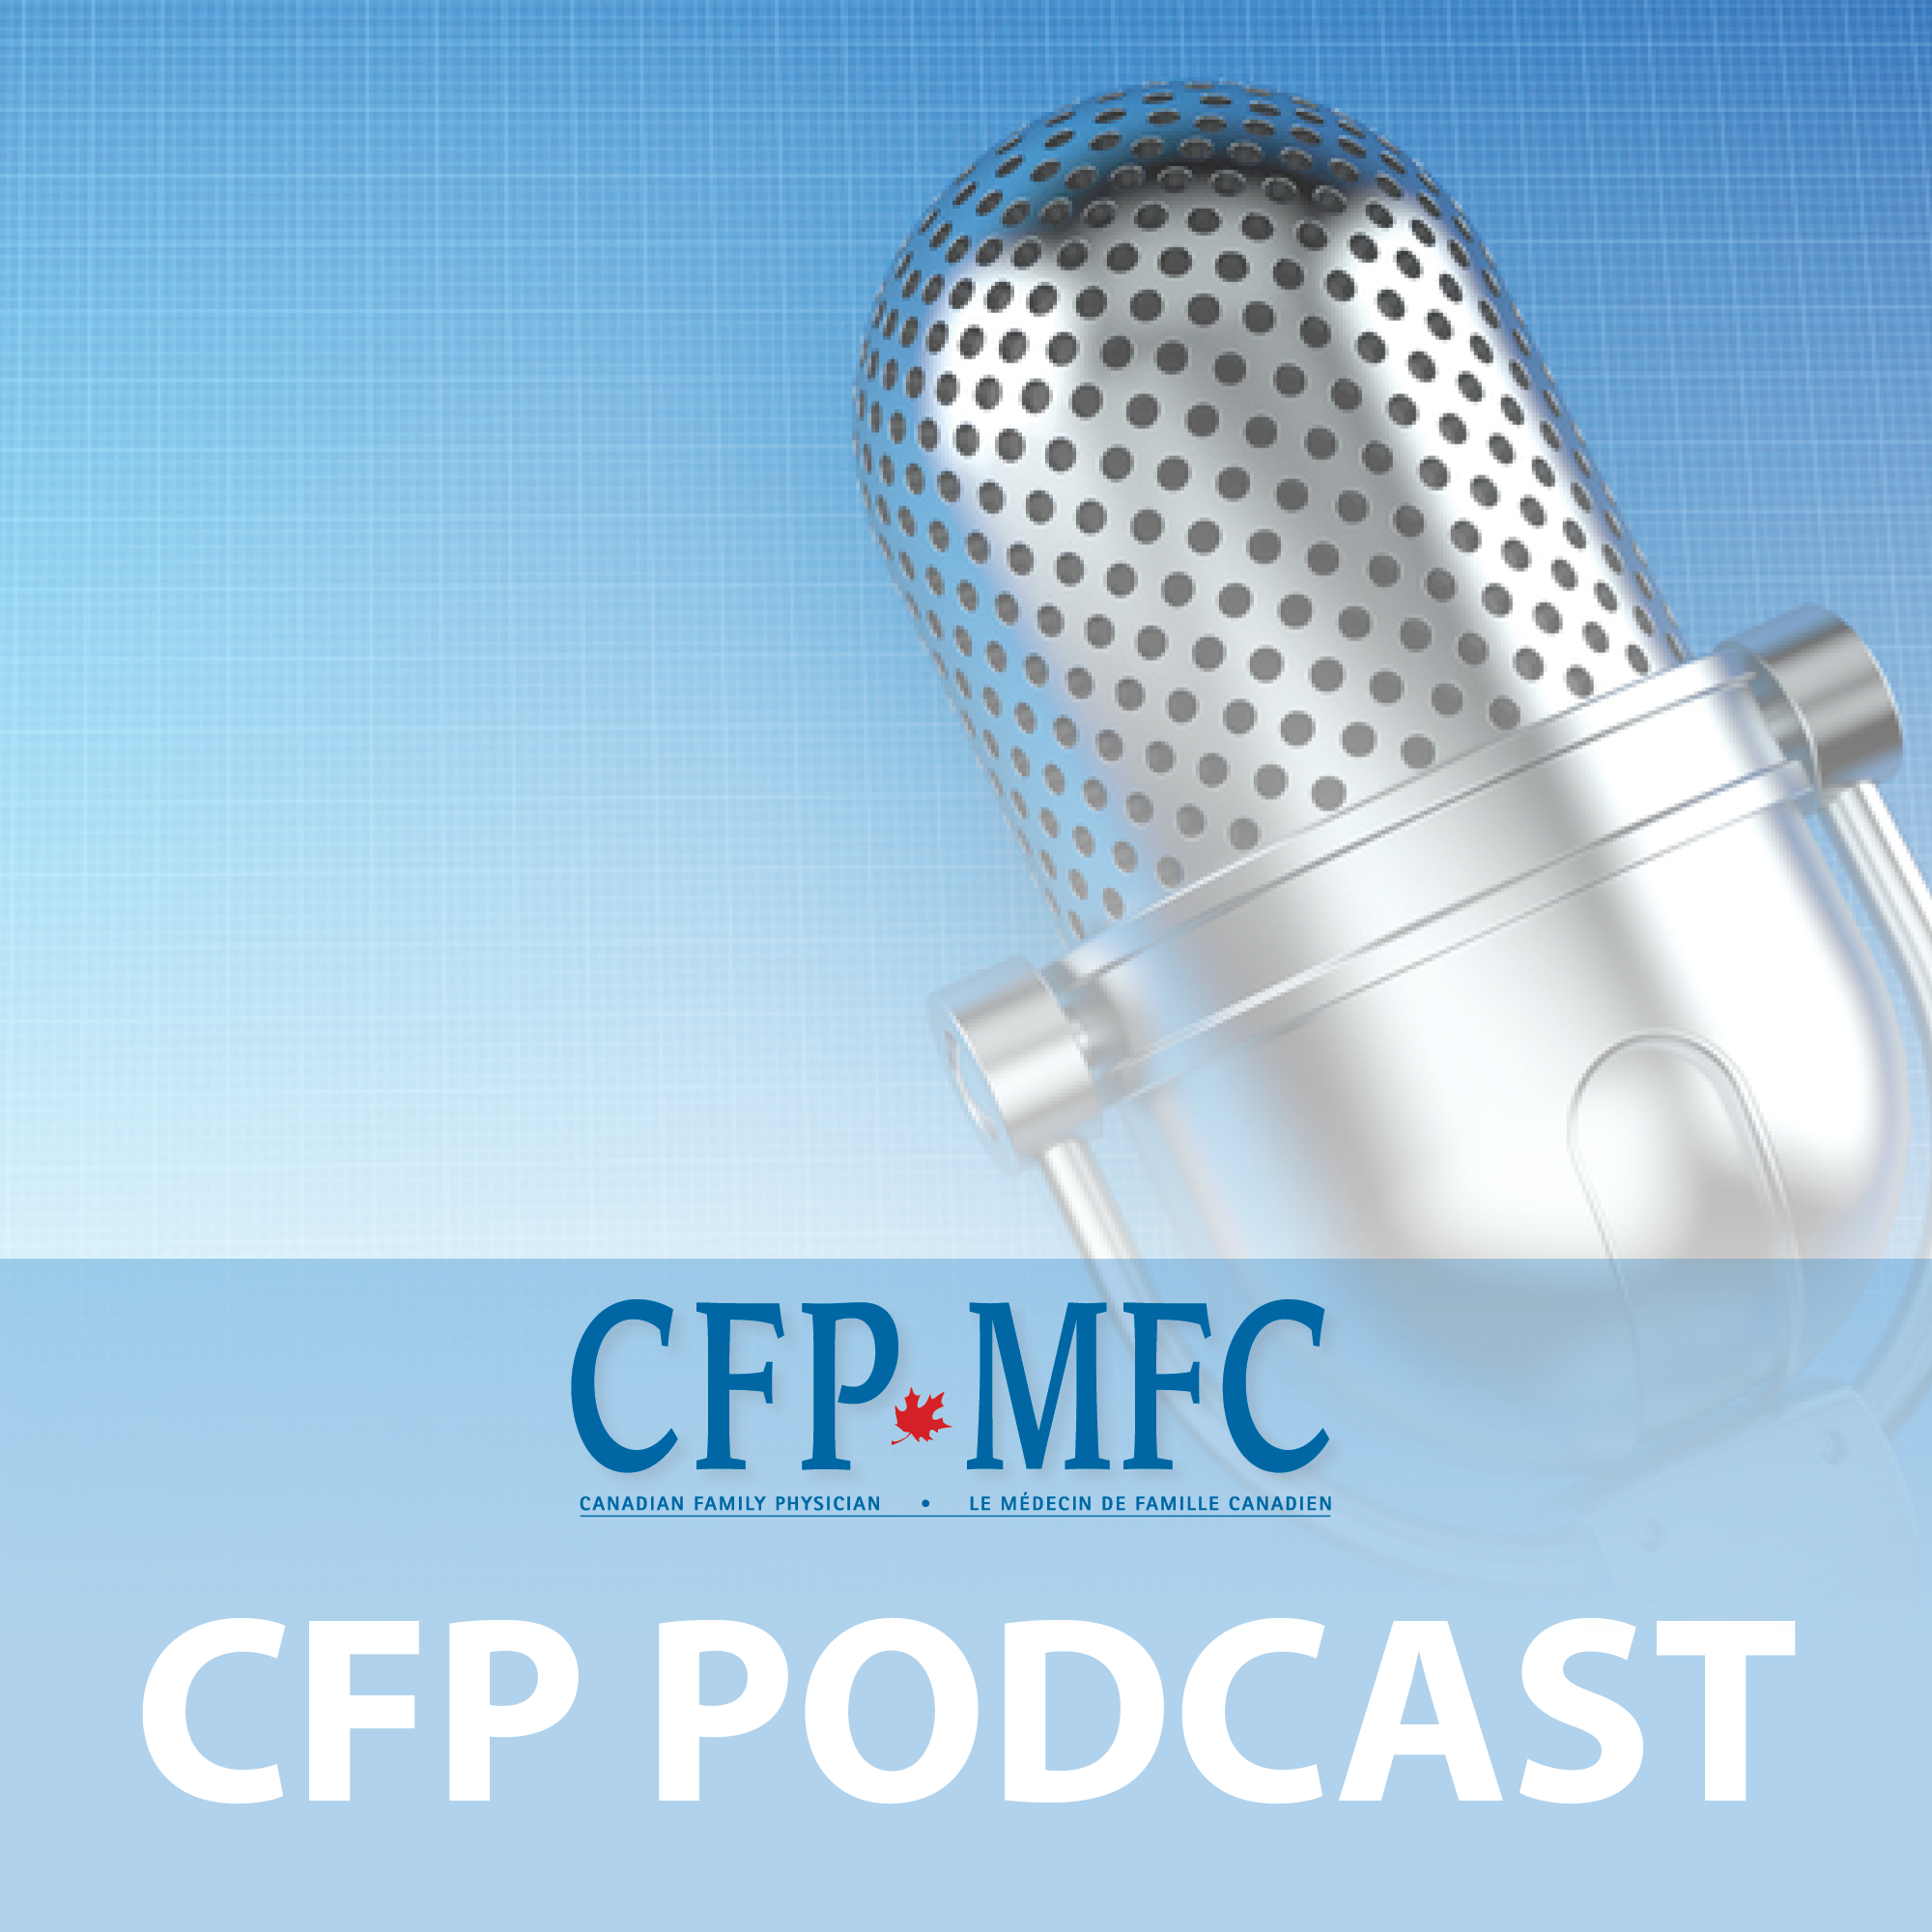 CFP Podcast show art